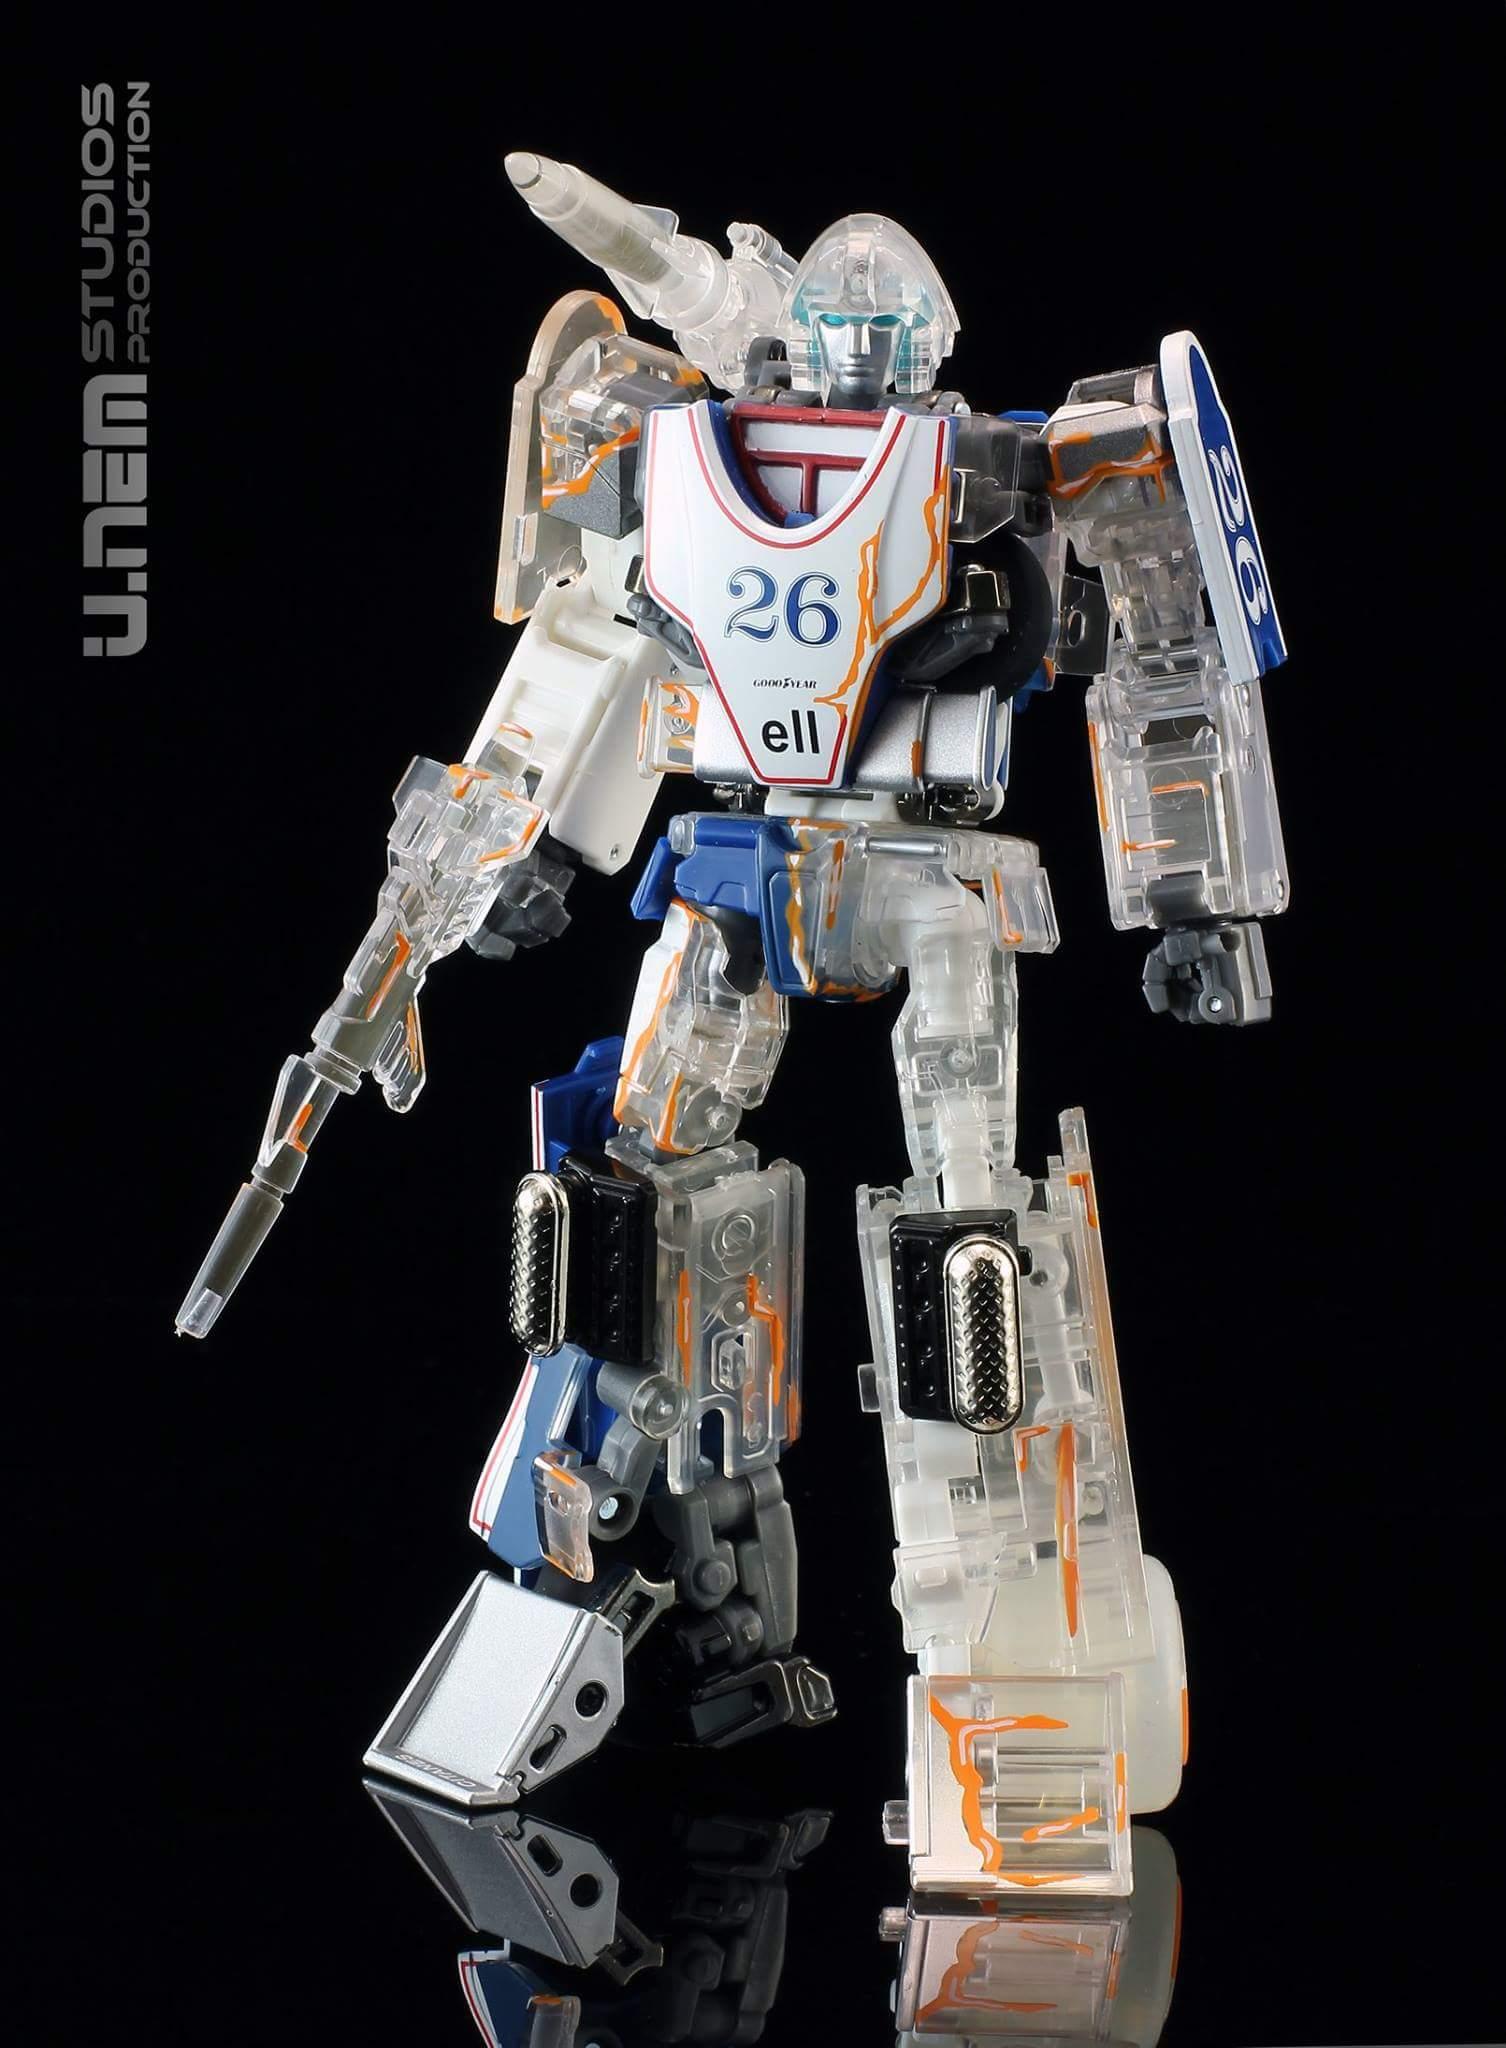 [Ocular Max] Produit Tiers - PS-01 Sphinx (aka Mirage G1) + PS-02 Liger (aka Mirage Diaclone) - Page 3 AKstO3tw